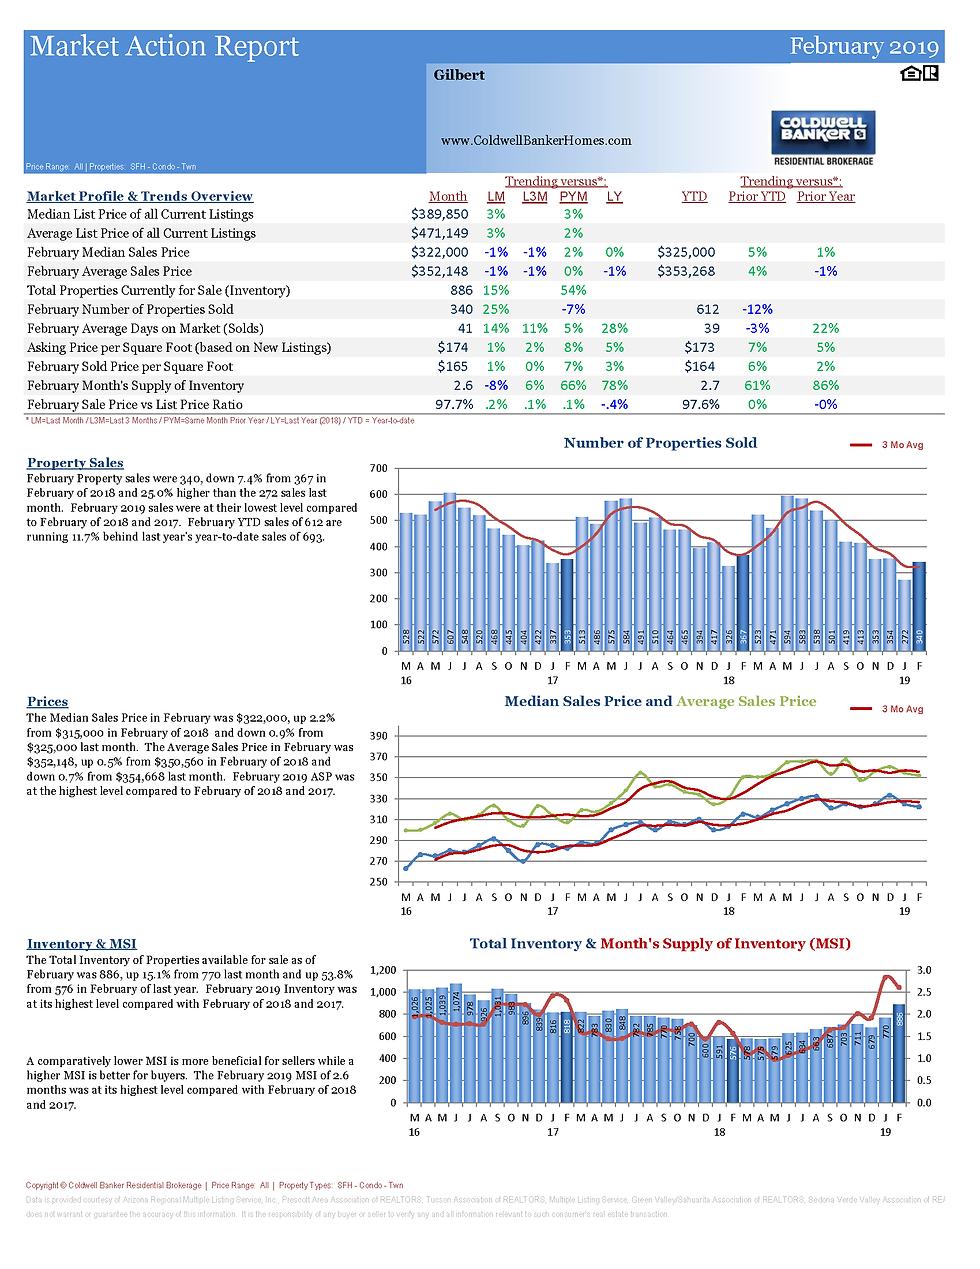 MarketActionReportGilbert_Page_1.png